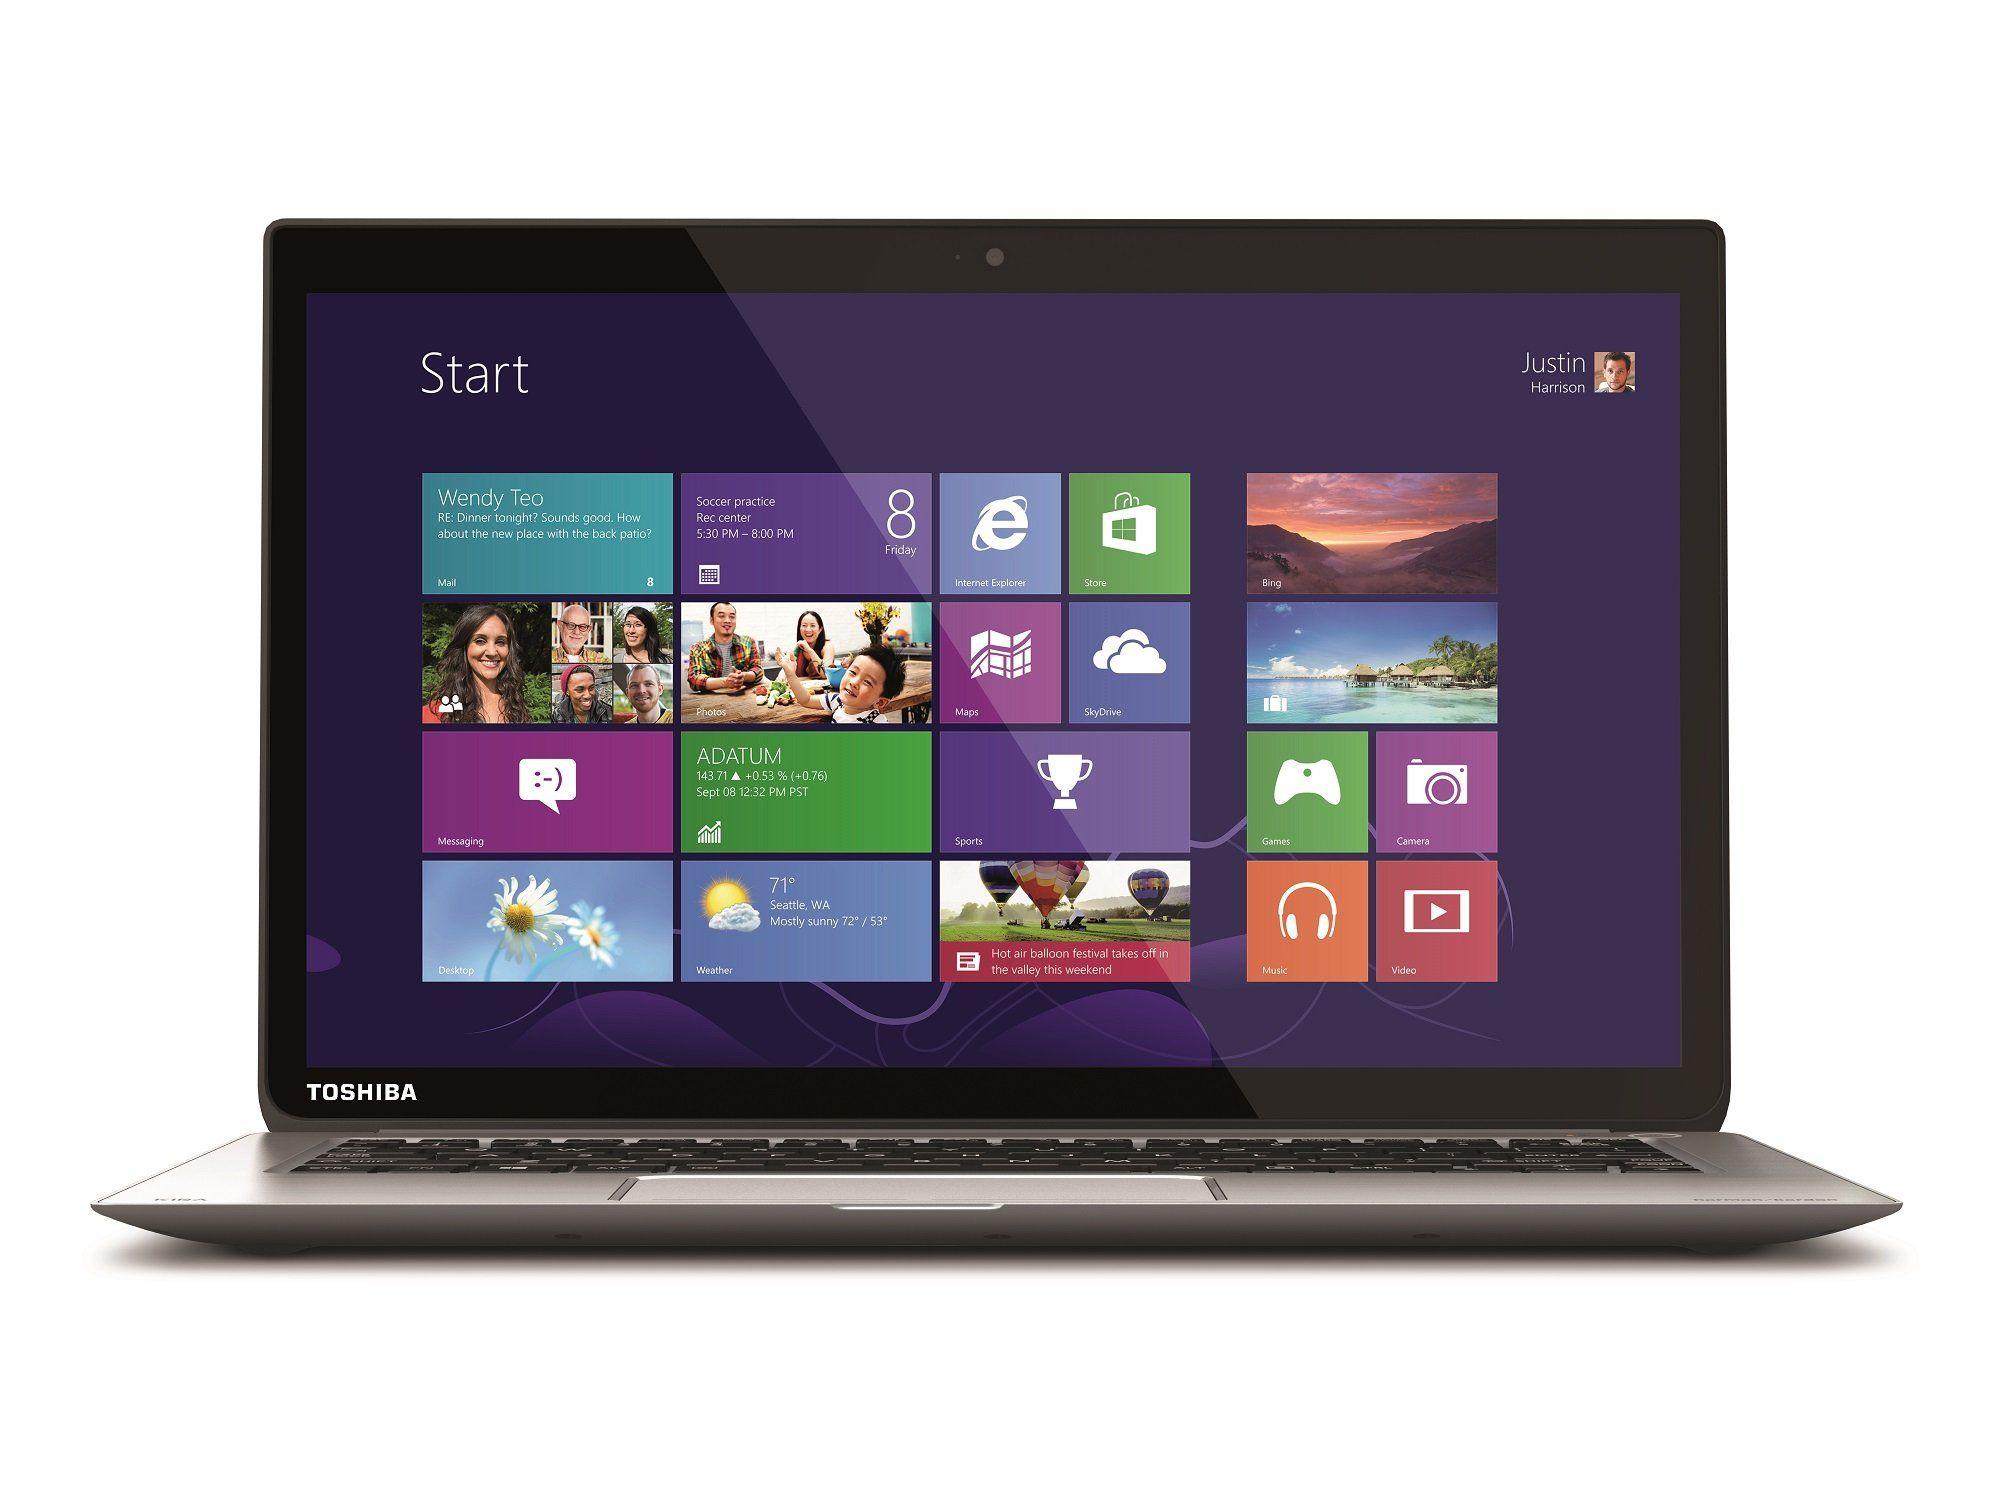 اسعار اللاب توب توشيبا فى مصر 2017 Laptop Windows 8 Laptop